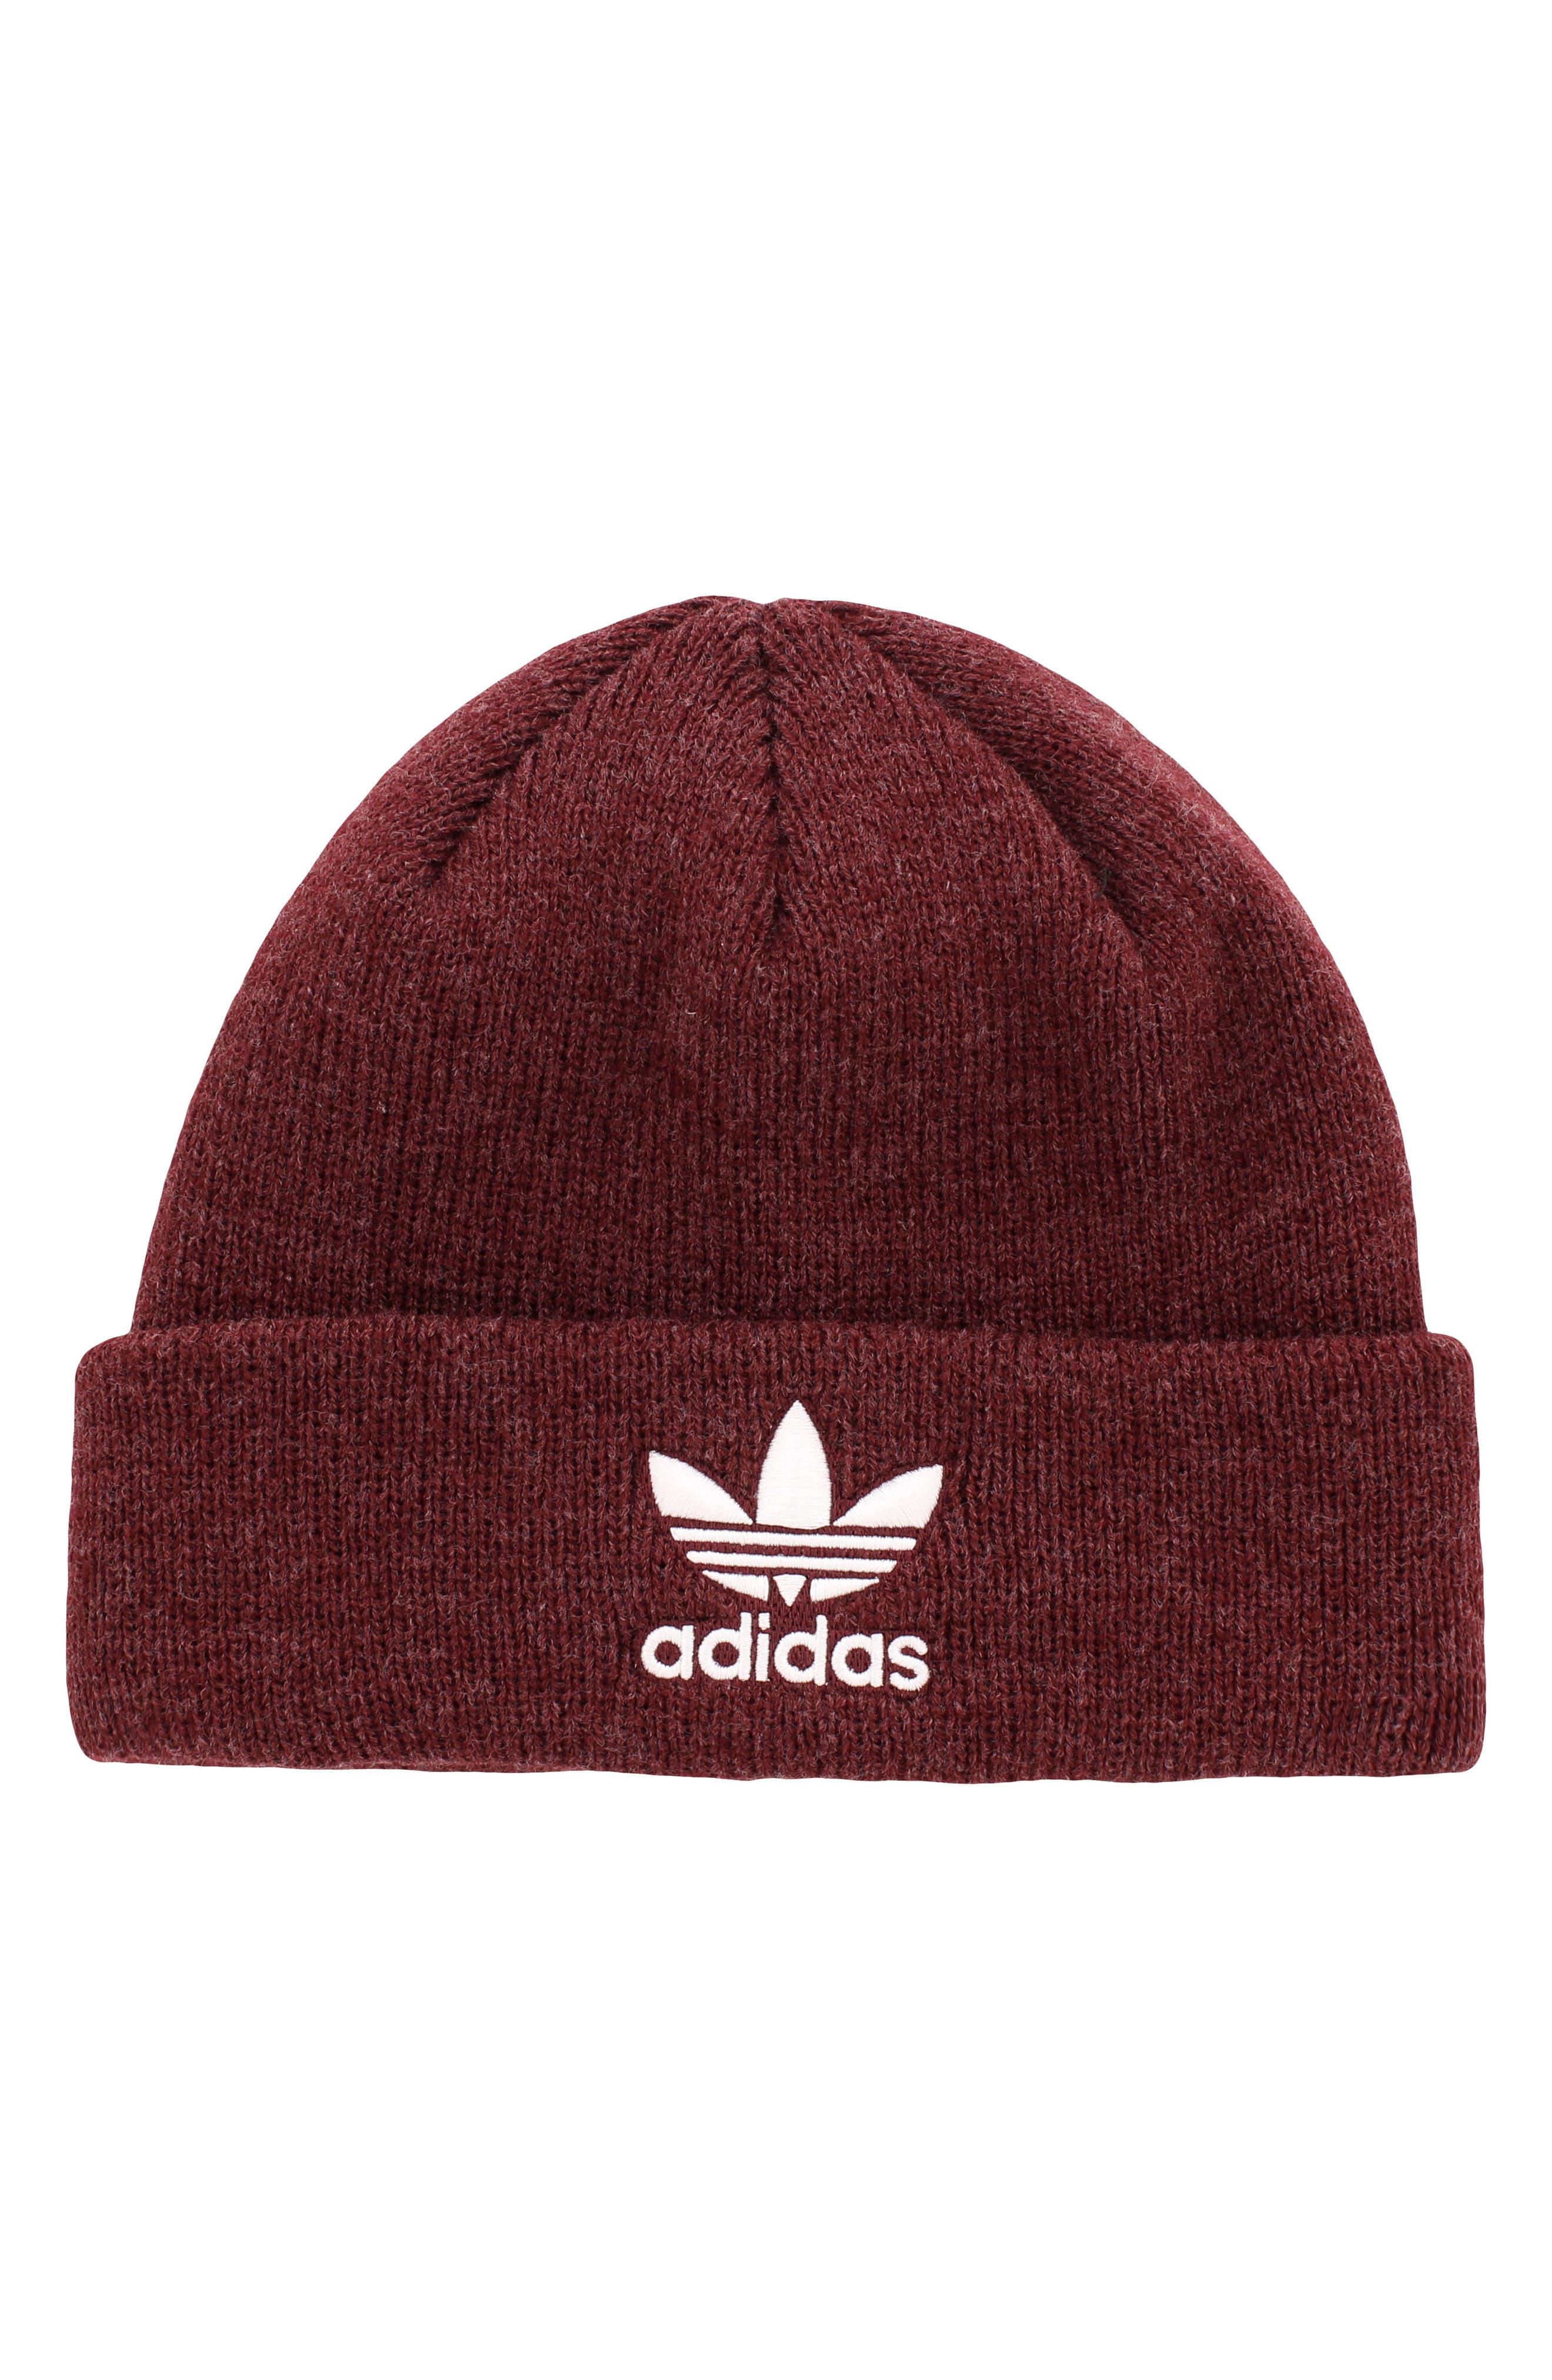 Alternate Image 1 Selected - adidas Originals Trefoil II Knit Cap